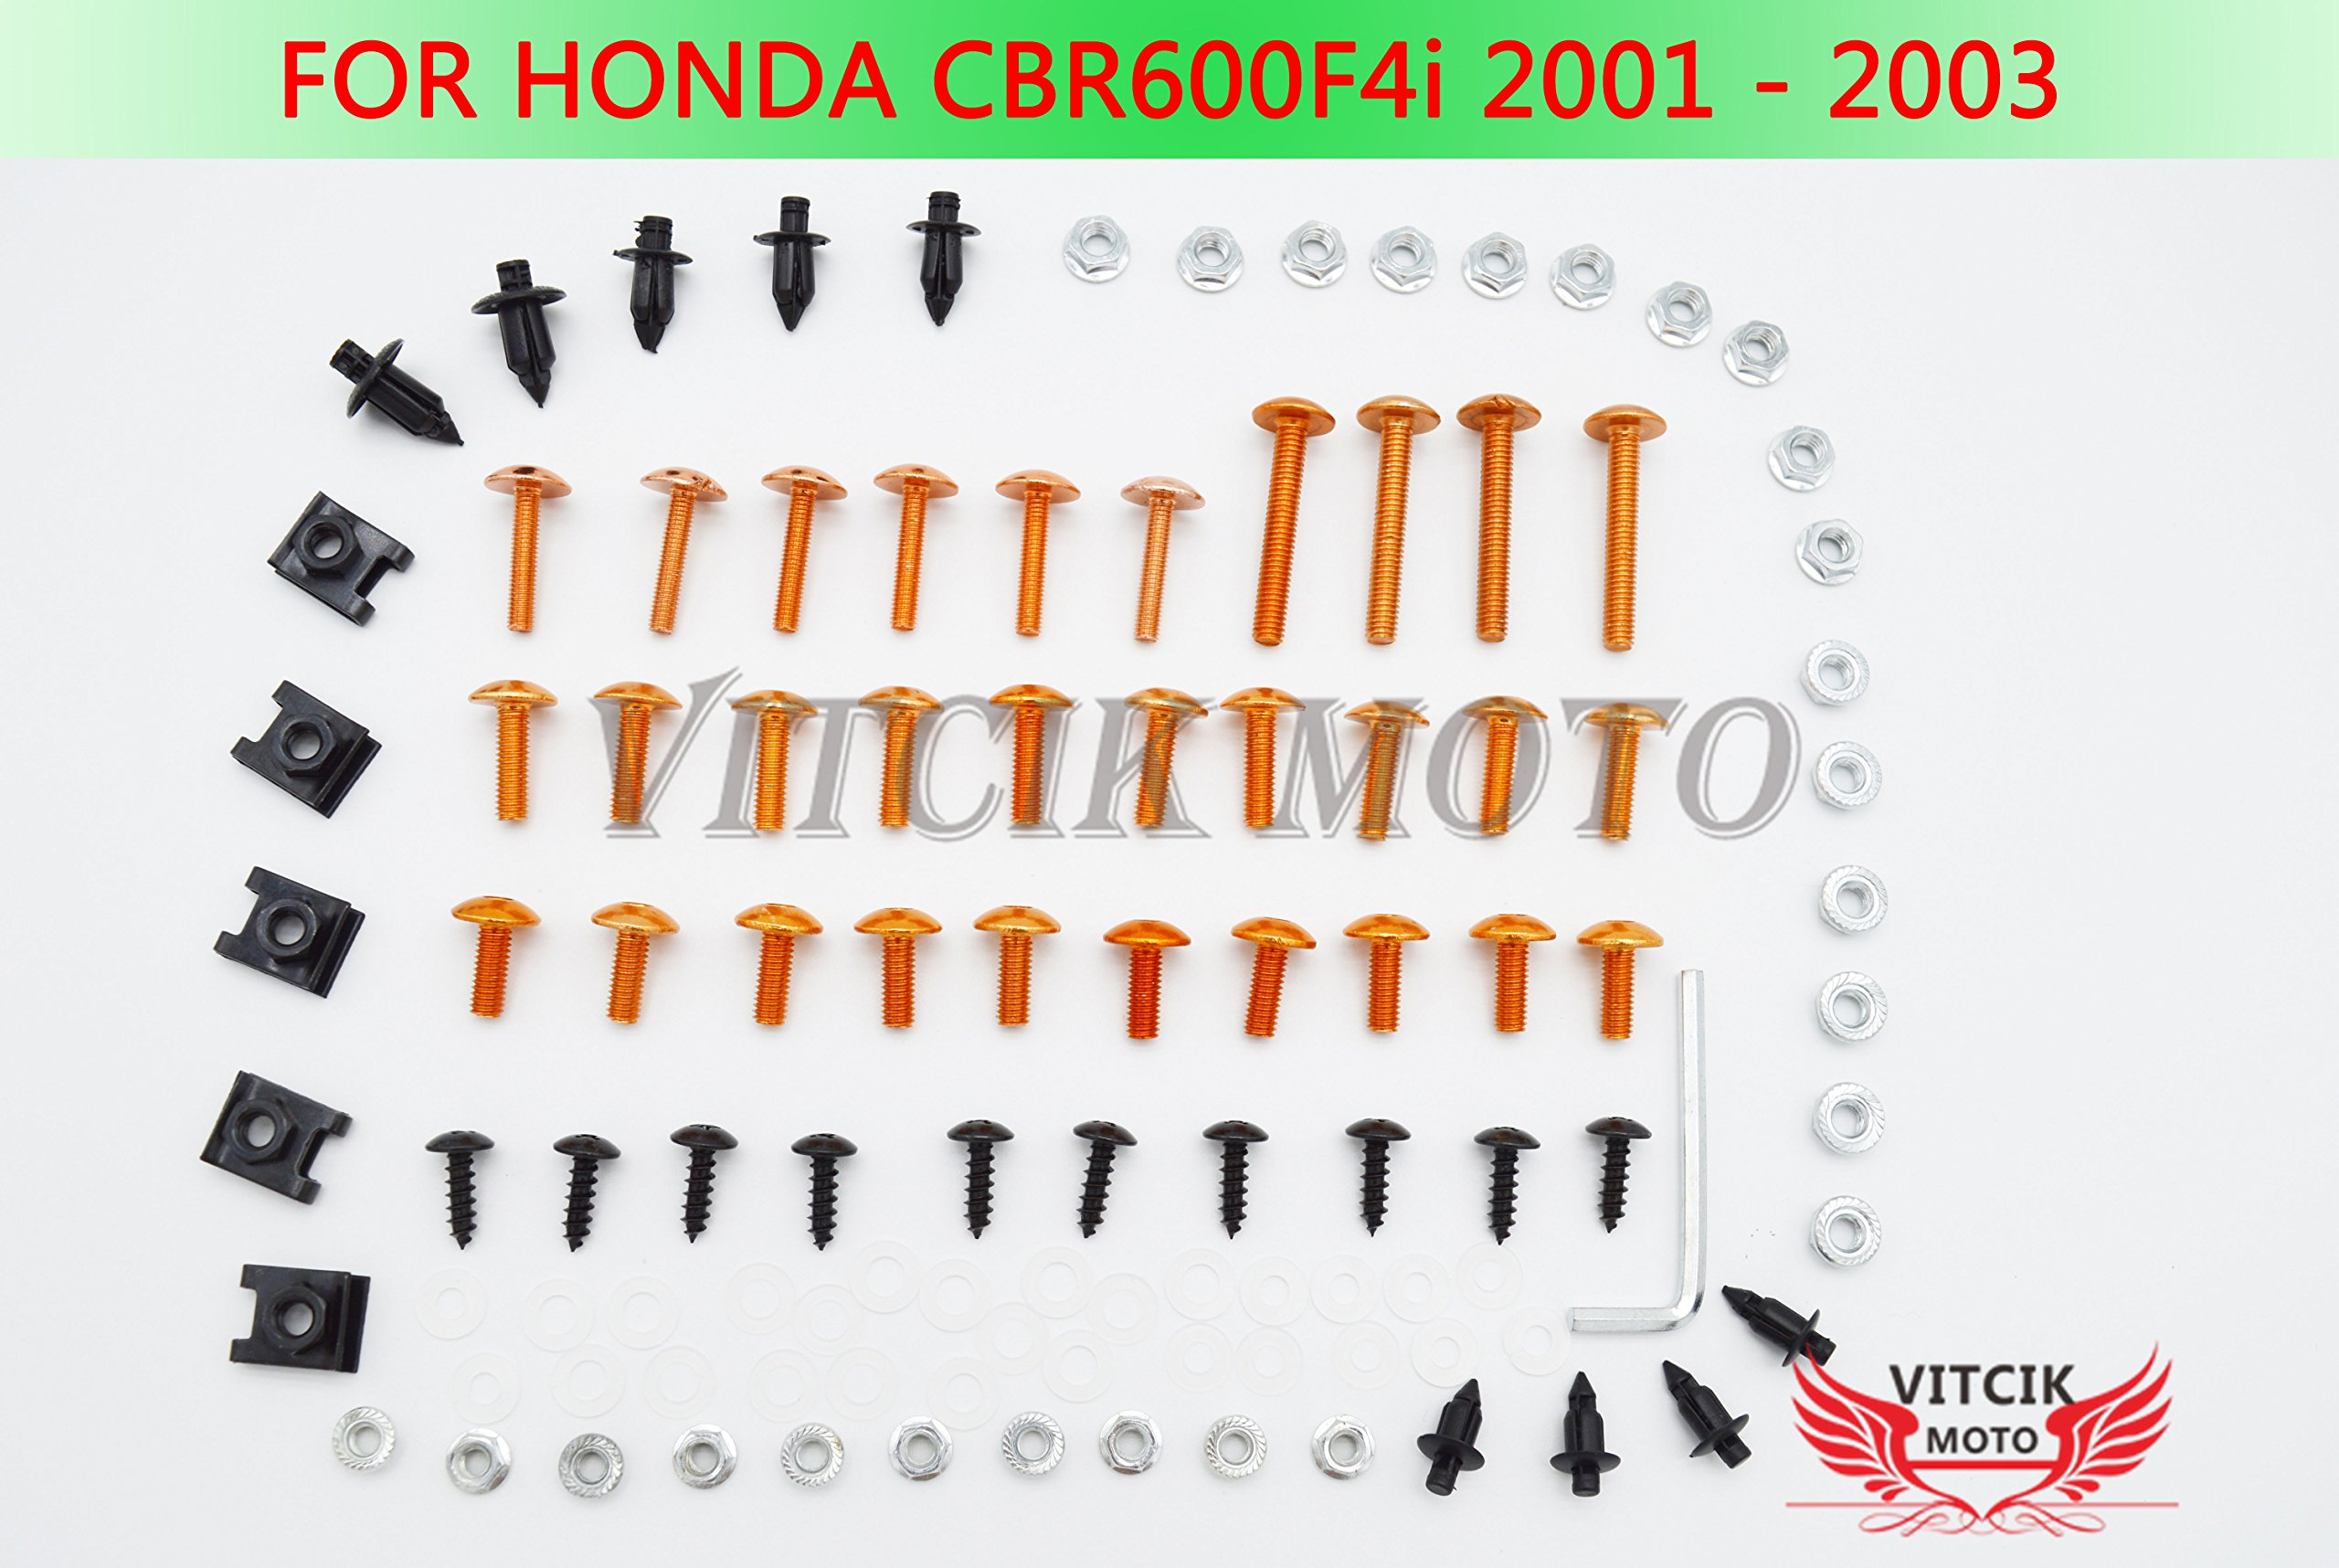 VITCIK Full Fairings Bolt Screw Kits for Honda CBR600F4i 2001 2002 2003 CBR 600 F4i 01 02 03 Motorcycle Fastener CNC Aluminium Clips (Orange & Silver)